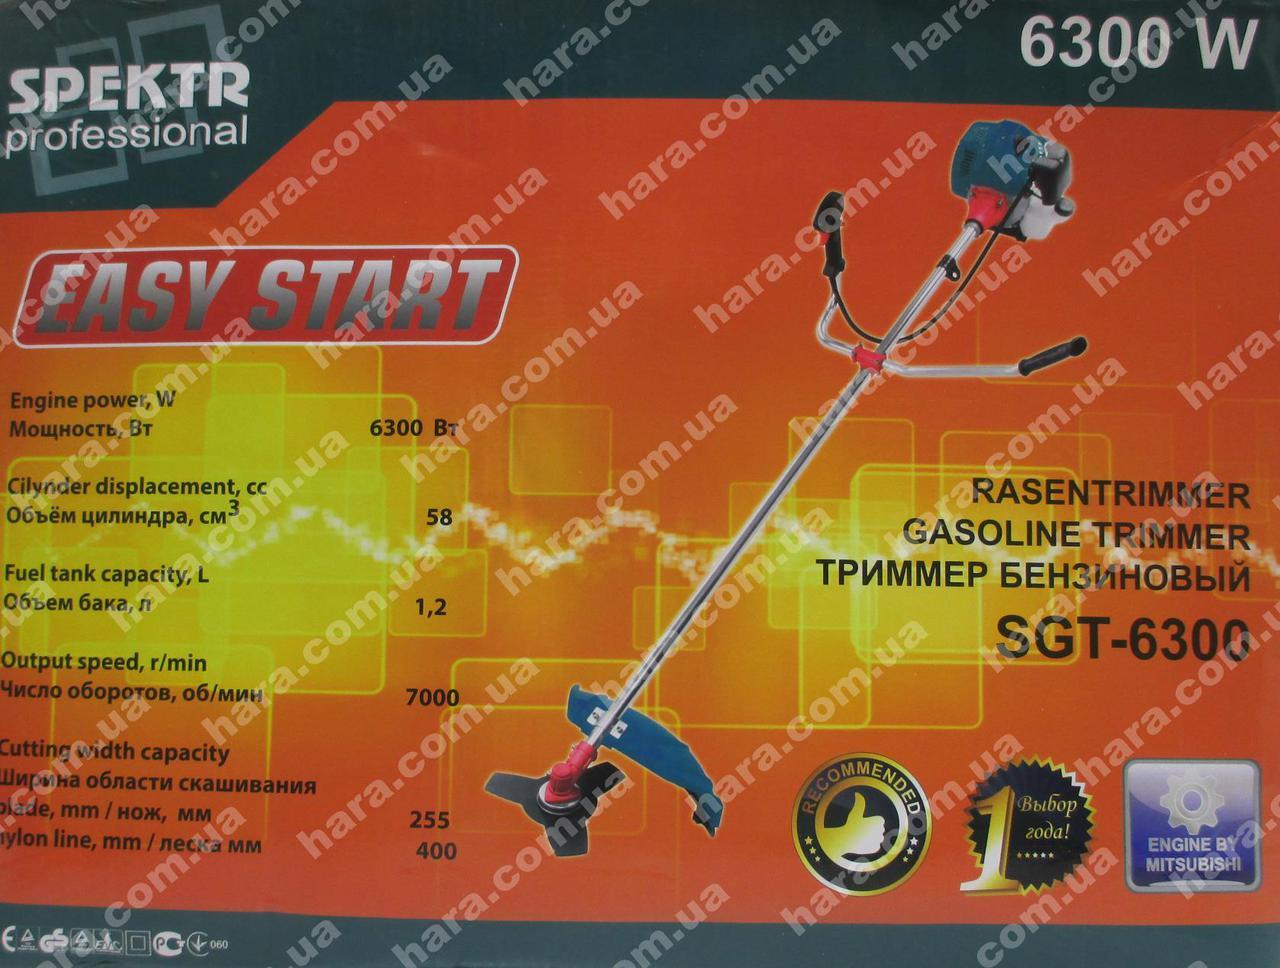 Бензокоса SPEKTR SGT-6300 (6300 Ватт)